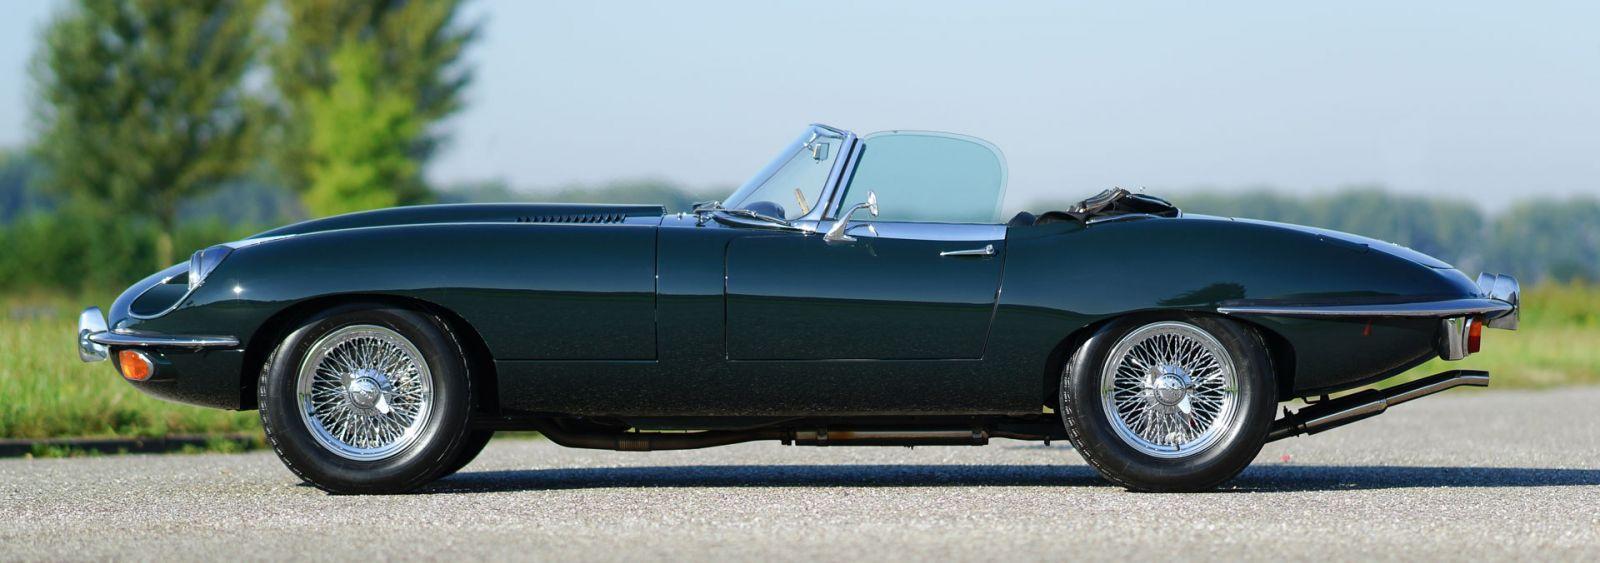 Jaguar E-type 4.2 Litre OTS, 1970 - Welcome to ClassiCarGarage